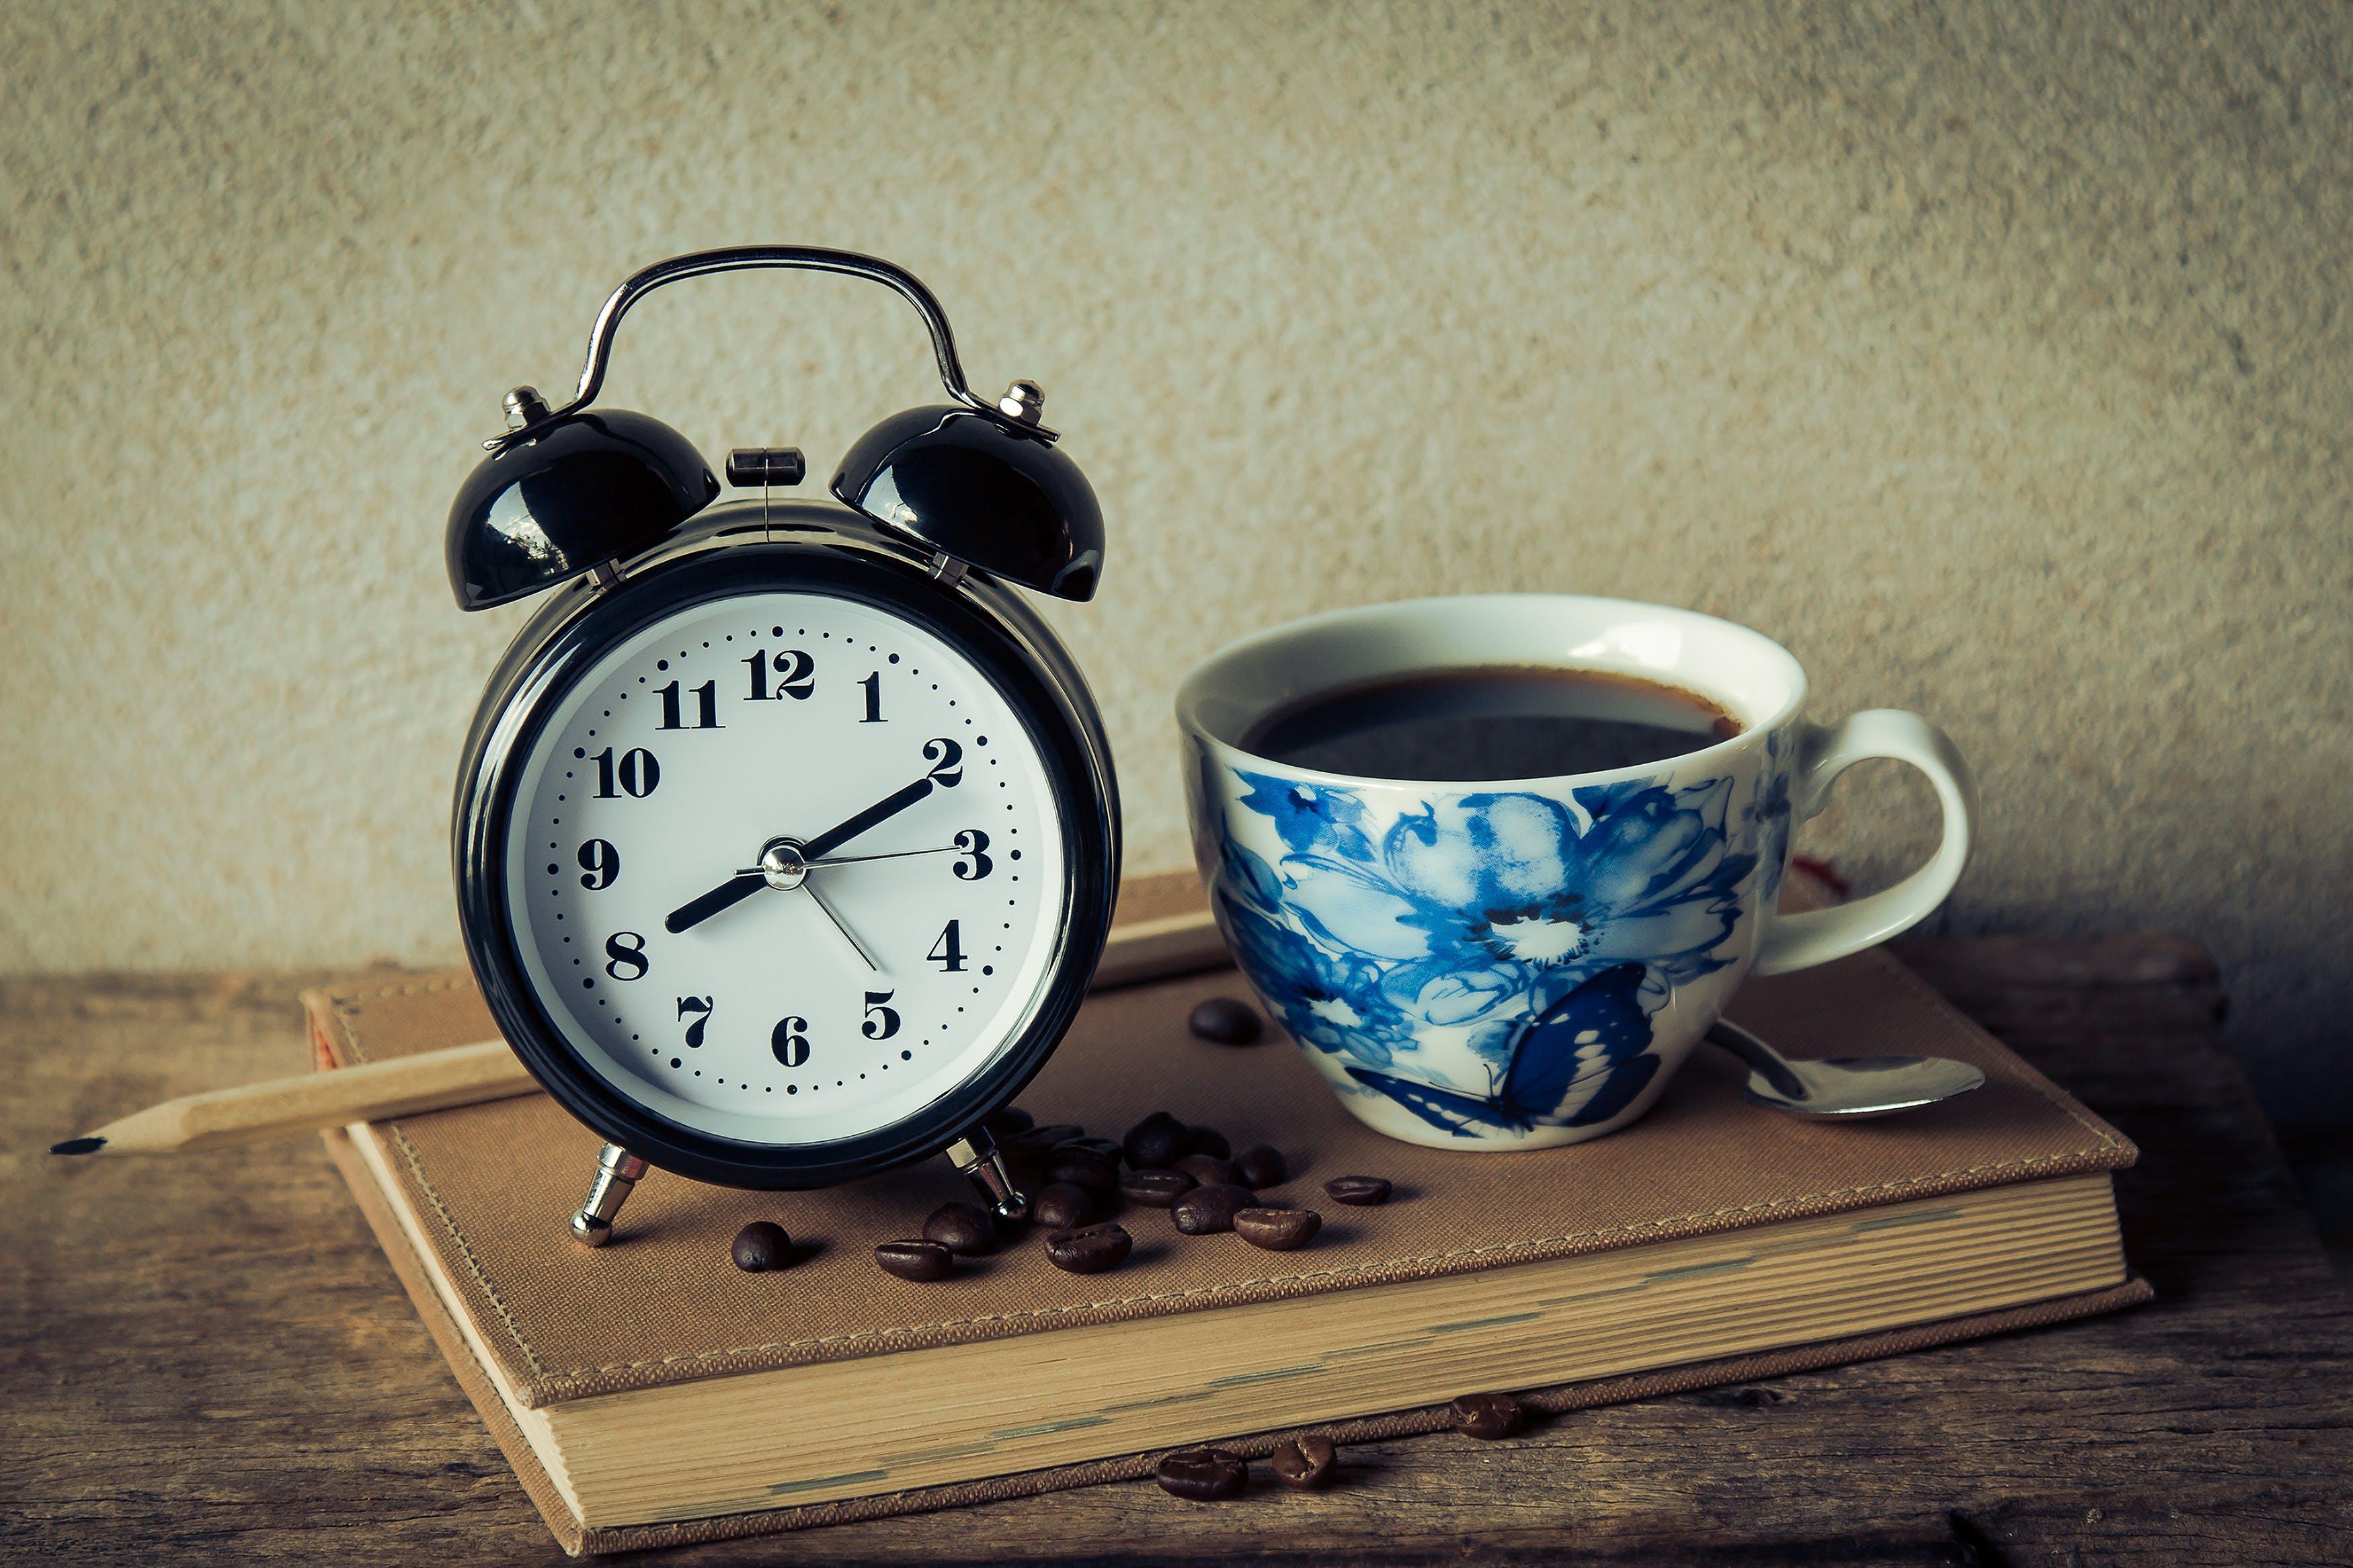 Round Black Analog Table Alarm Clock